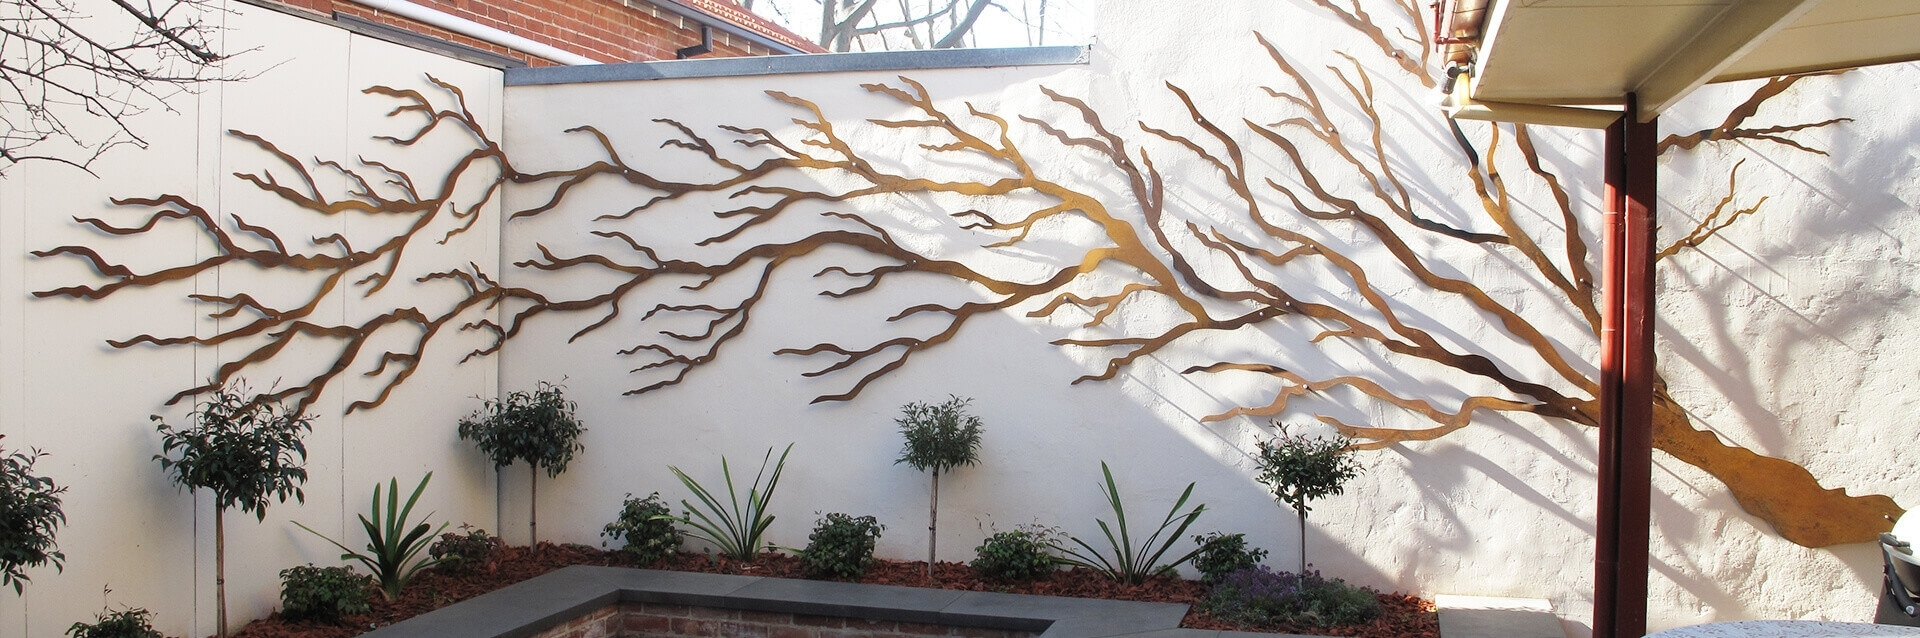 Outdoor Wall Hangings Art Japsinfo Australia Nz Sculptures Metal throughout Outdoor Wall Art (Image 15 of 20)